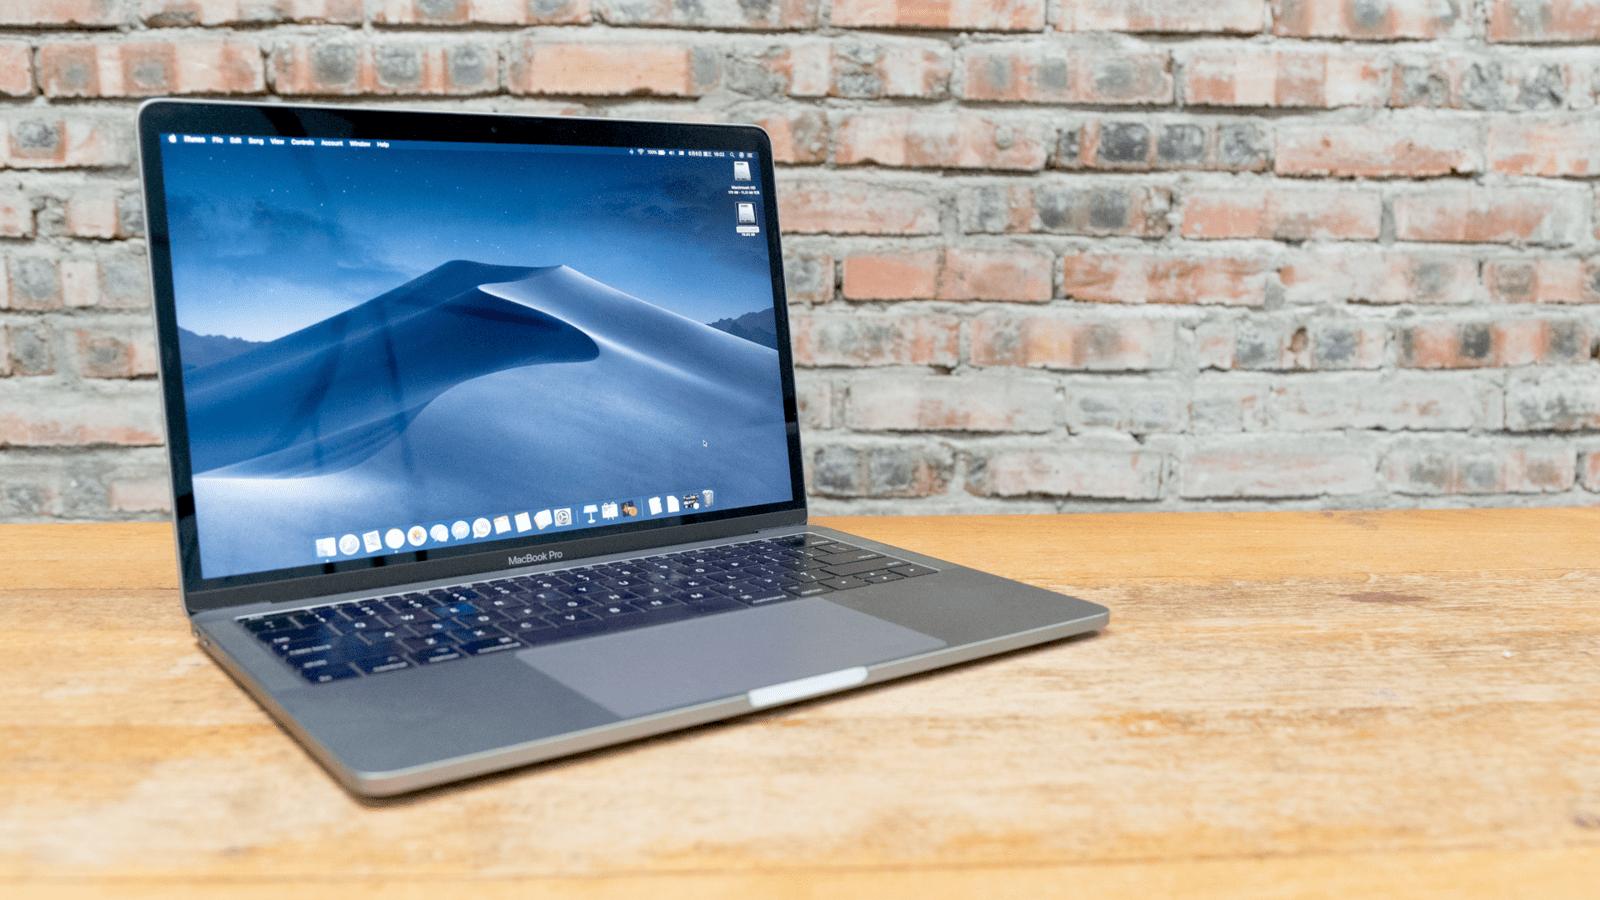 【教學】macOS Mojave 實測 Dark Mode+Finder功能示範